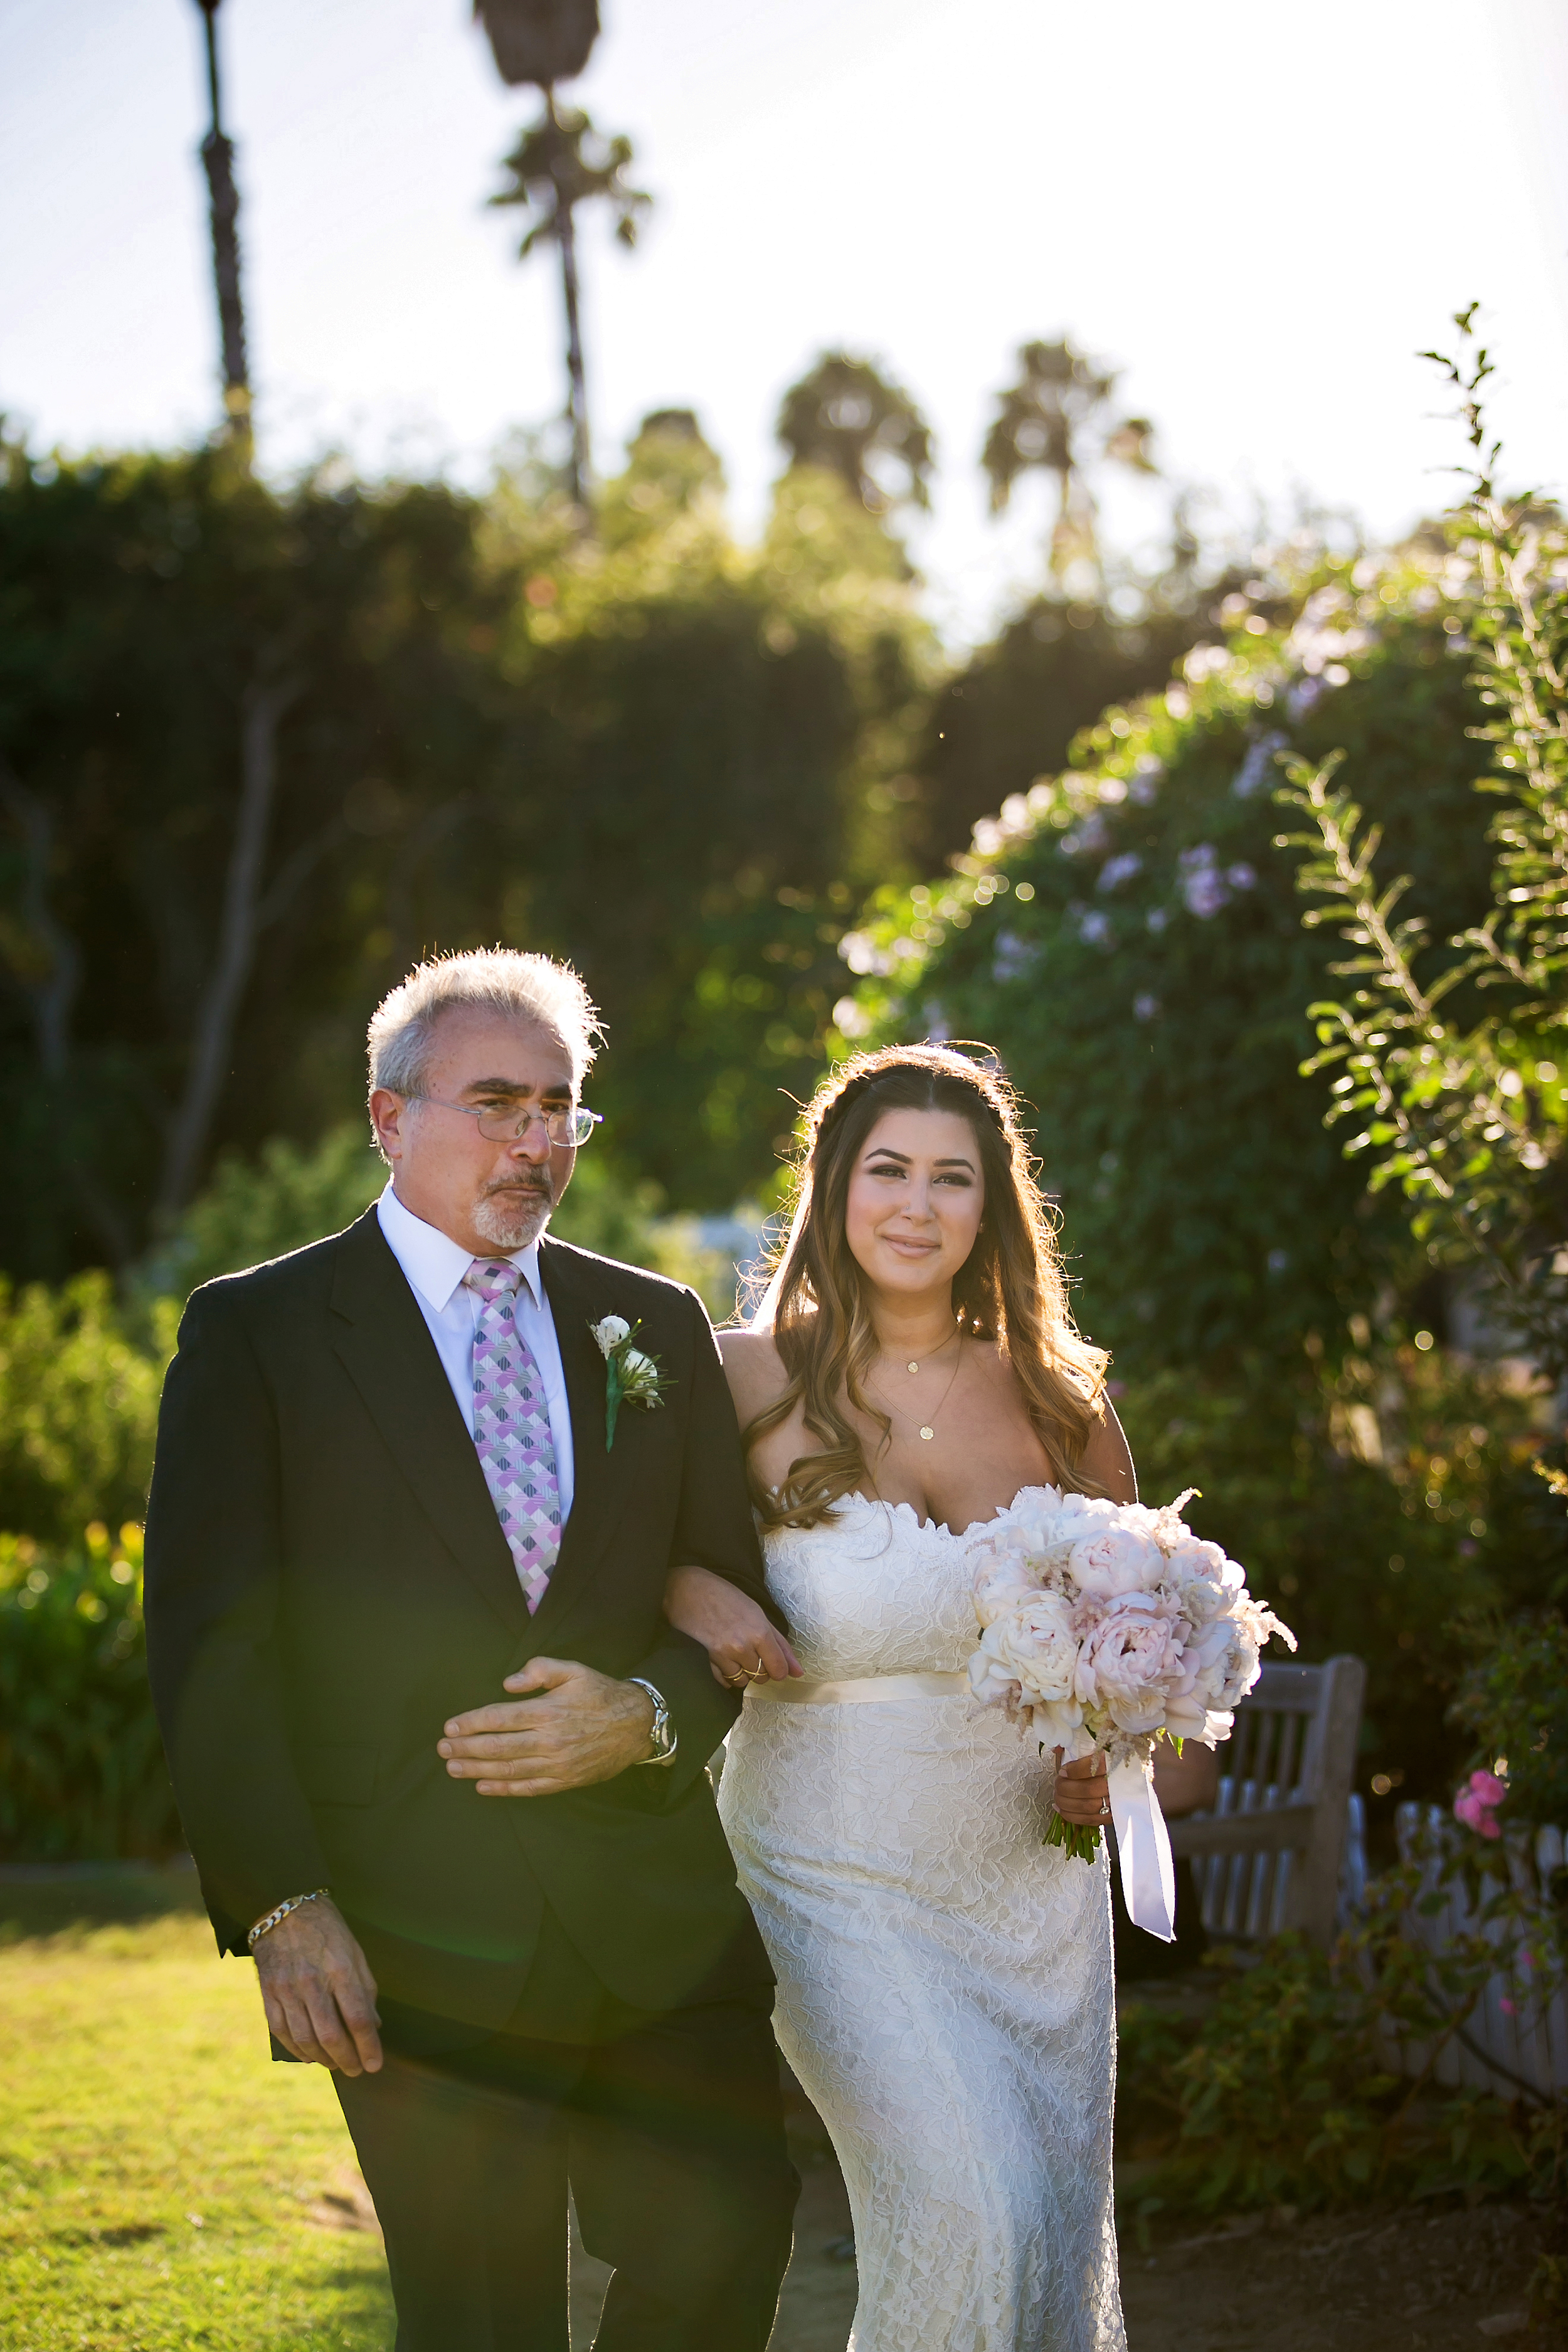 los angeles wedding photographer_ south coast botanic garden_wedding_05.jpg